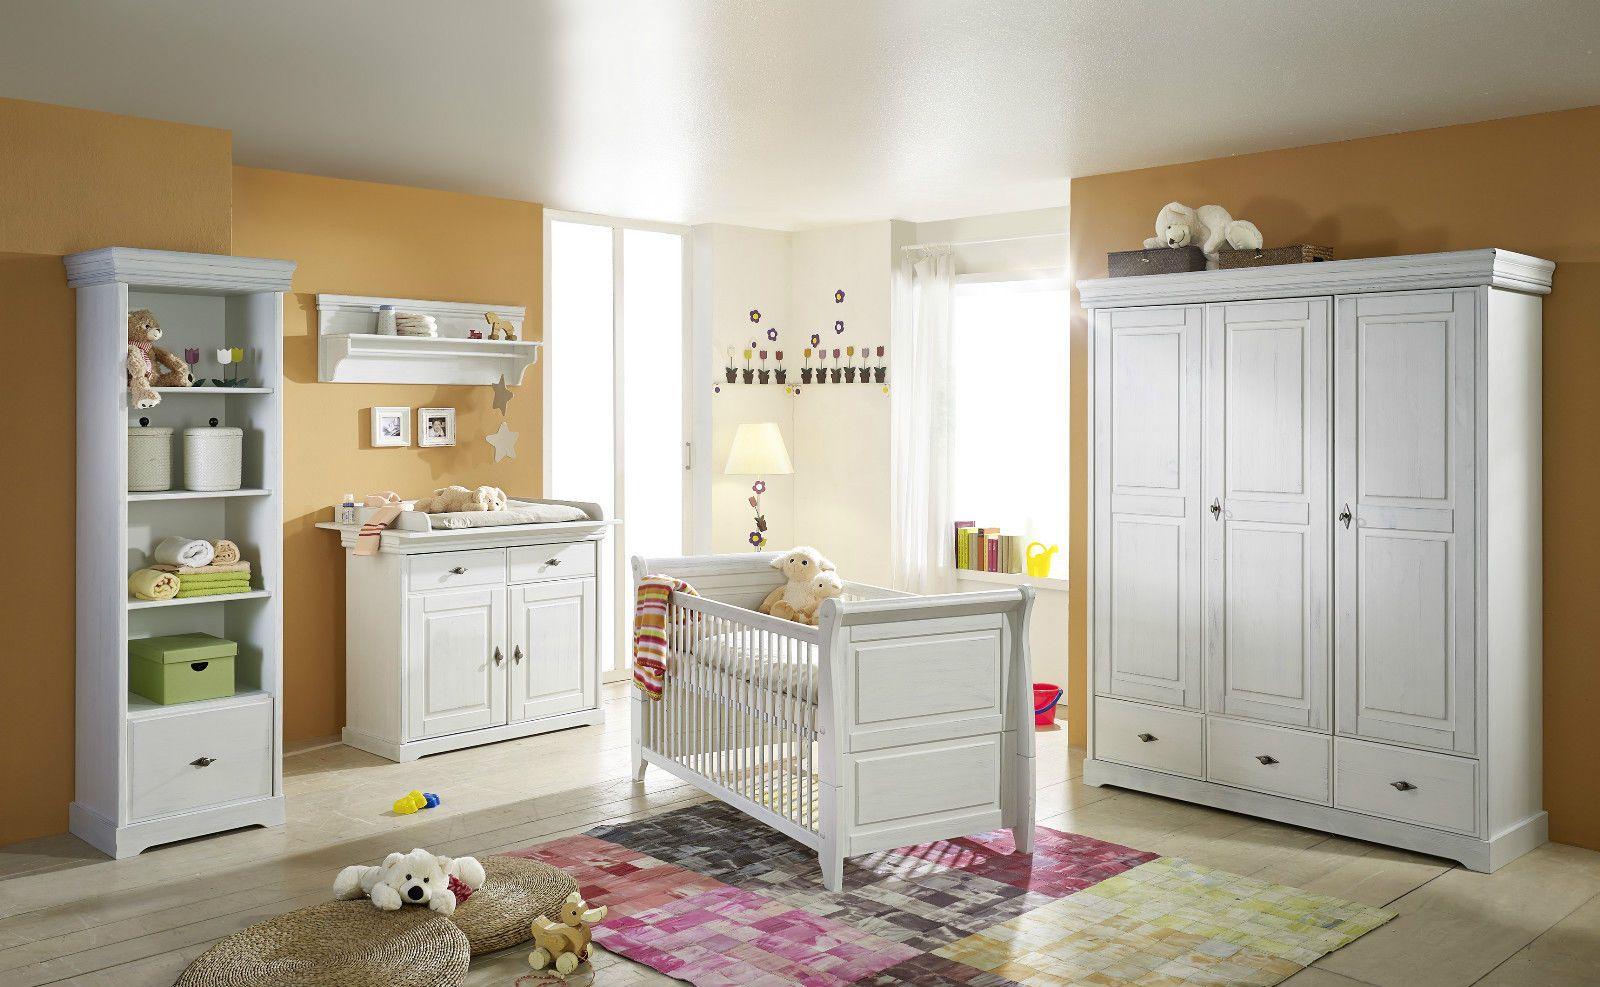 Kinderzimmer ohne bett etagenbett kiddikiefer zum lieferumfang gehören außer dem bett